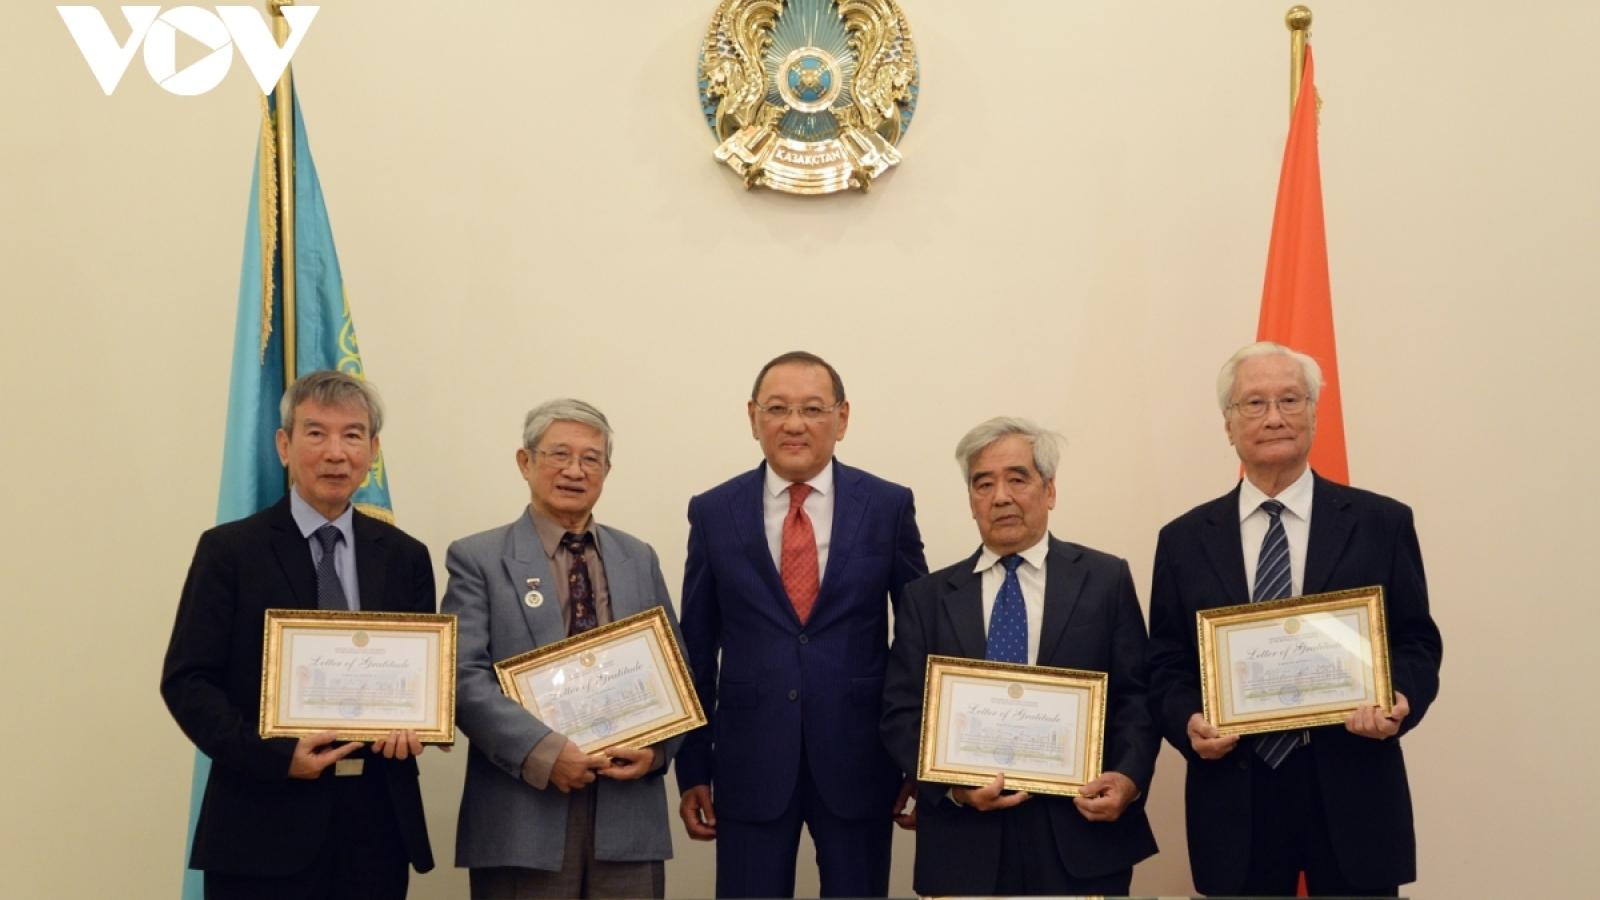 Vietnamese translators honoured for boosting cultural ties with Kazakhstan